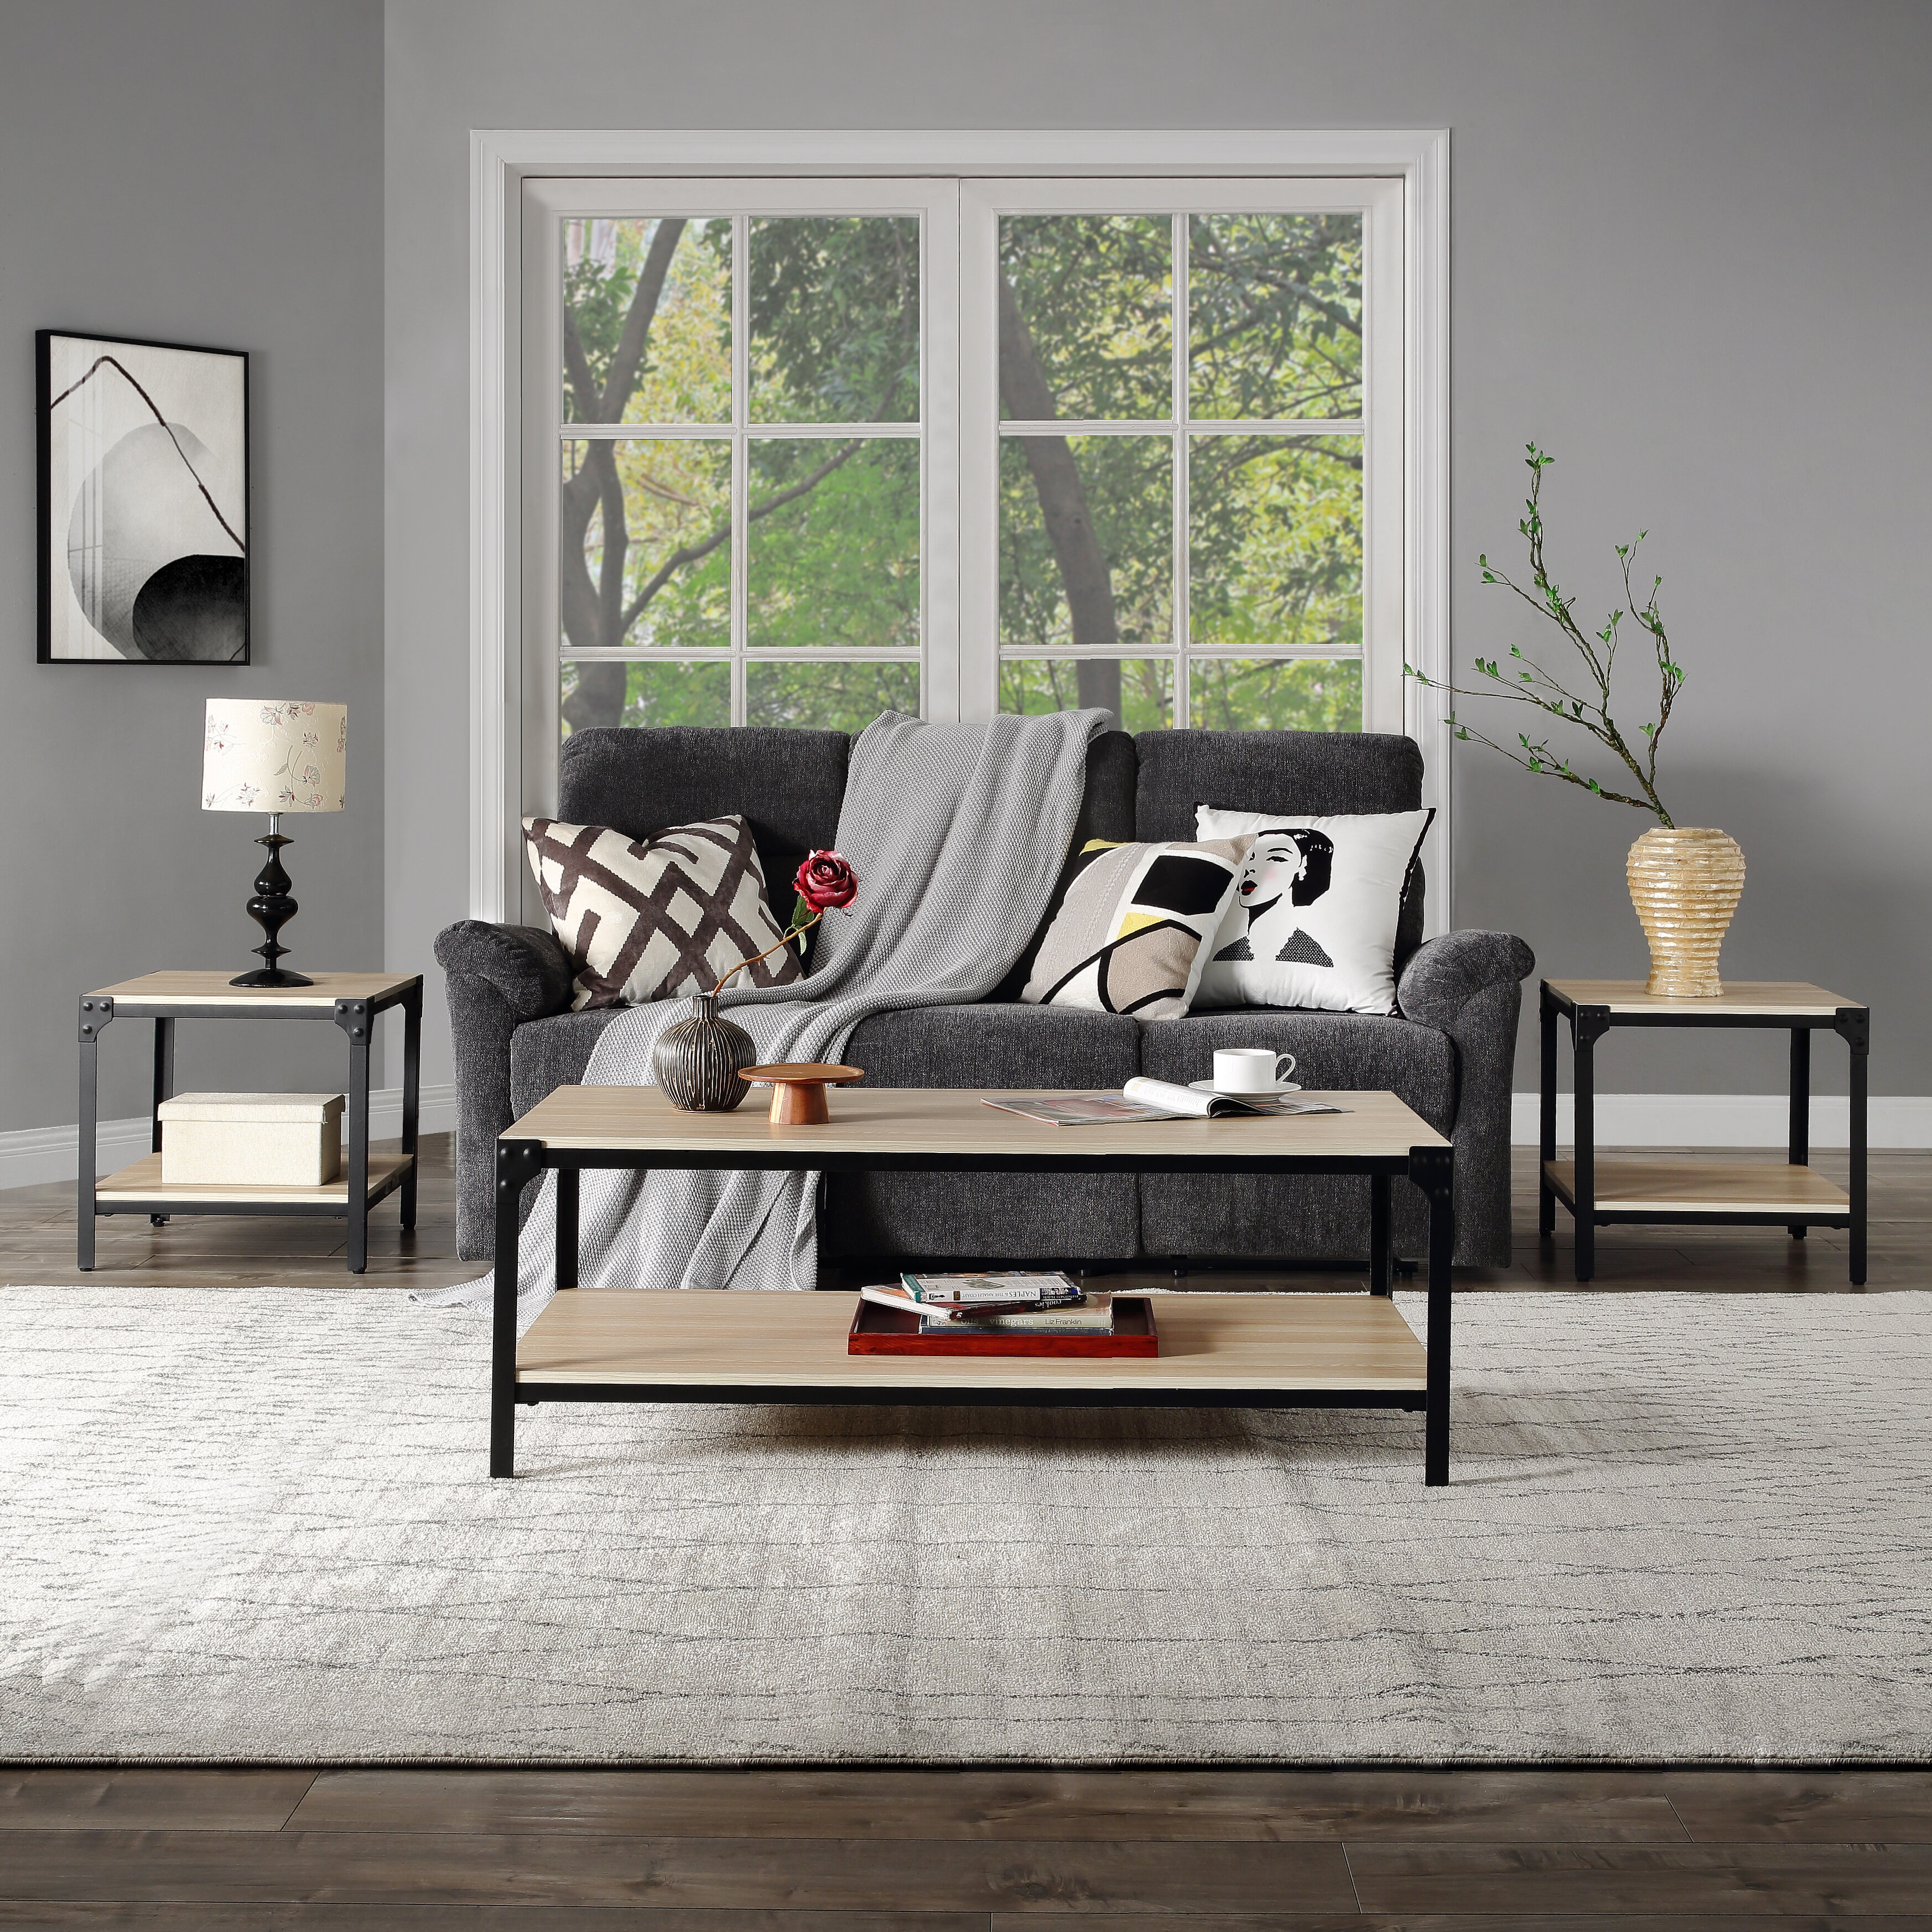 Belsize 11 Piece Coffee & End Table Set Wood Modern Living Room Furniture  Decor